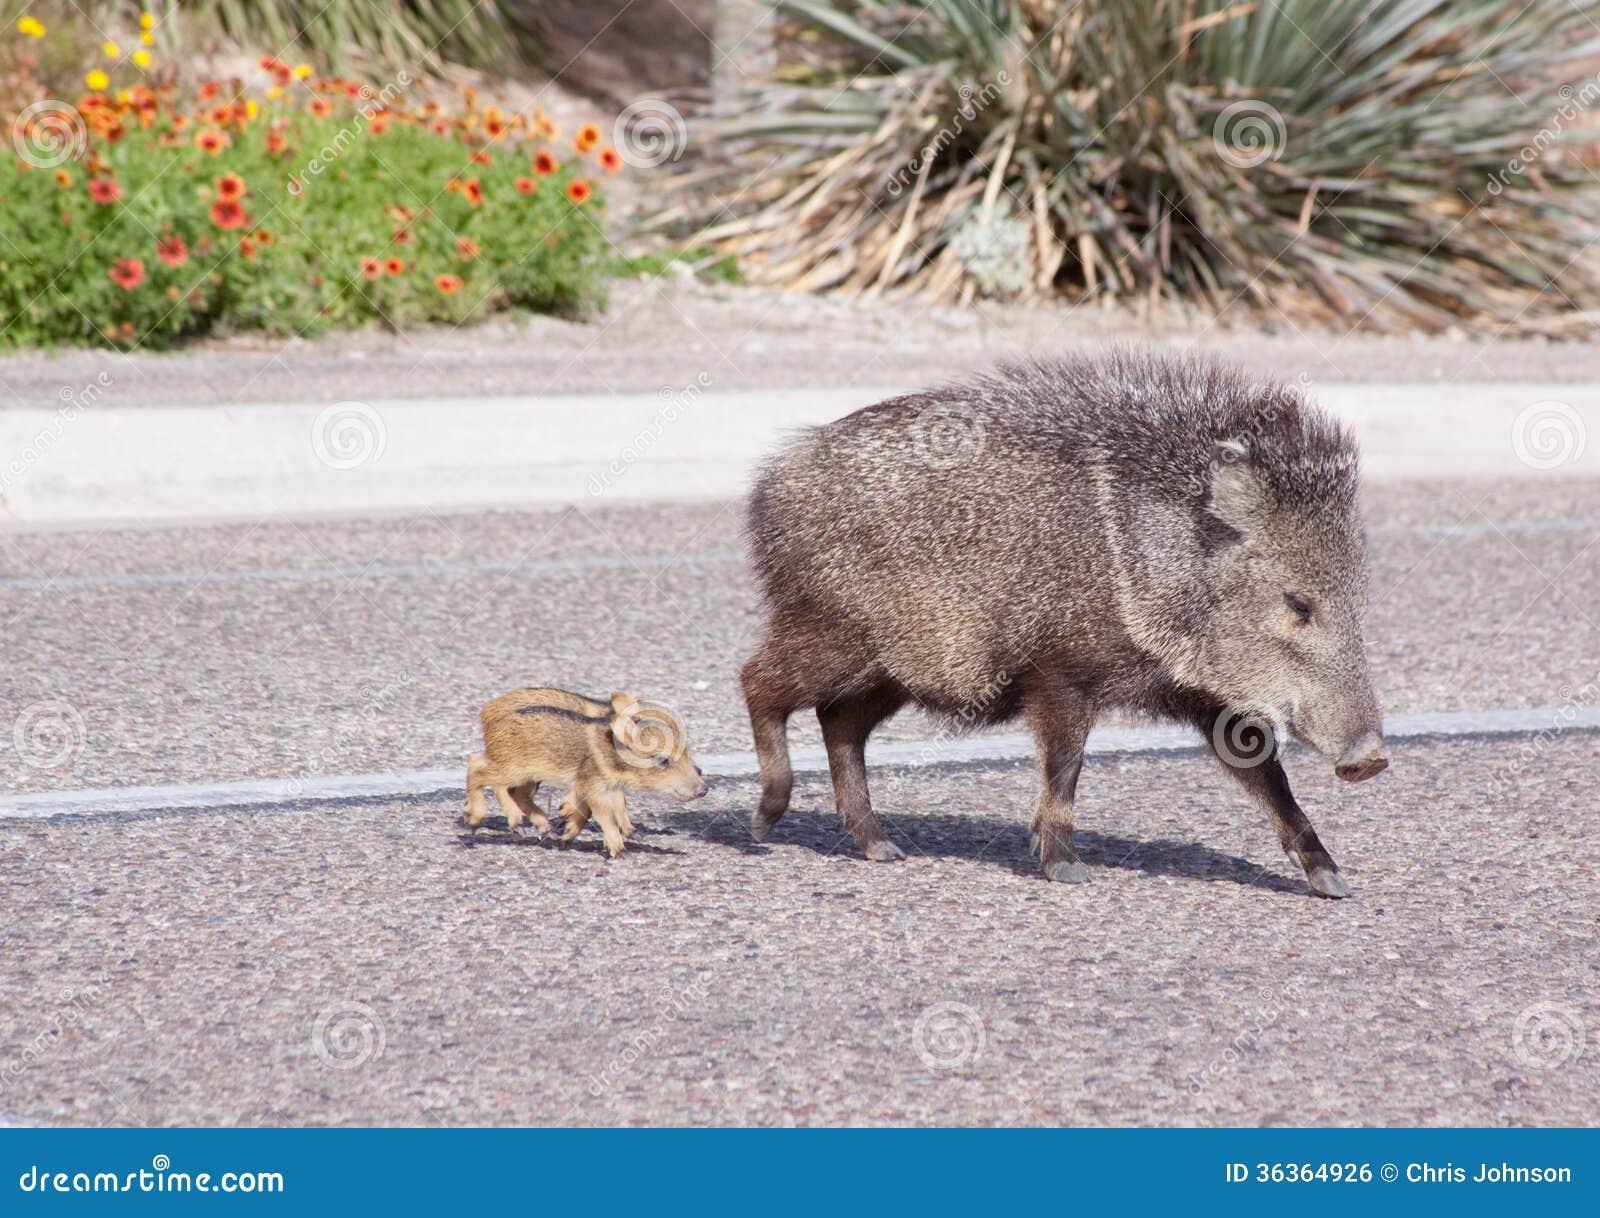 Wild Javelina And Babies Royalty Free Stock Image - Image: 36364926